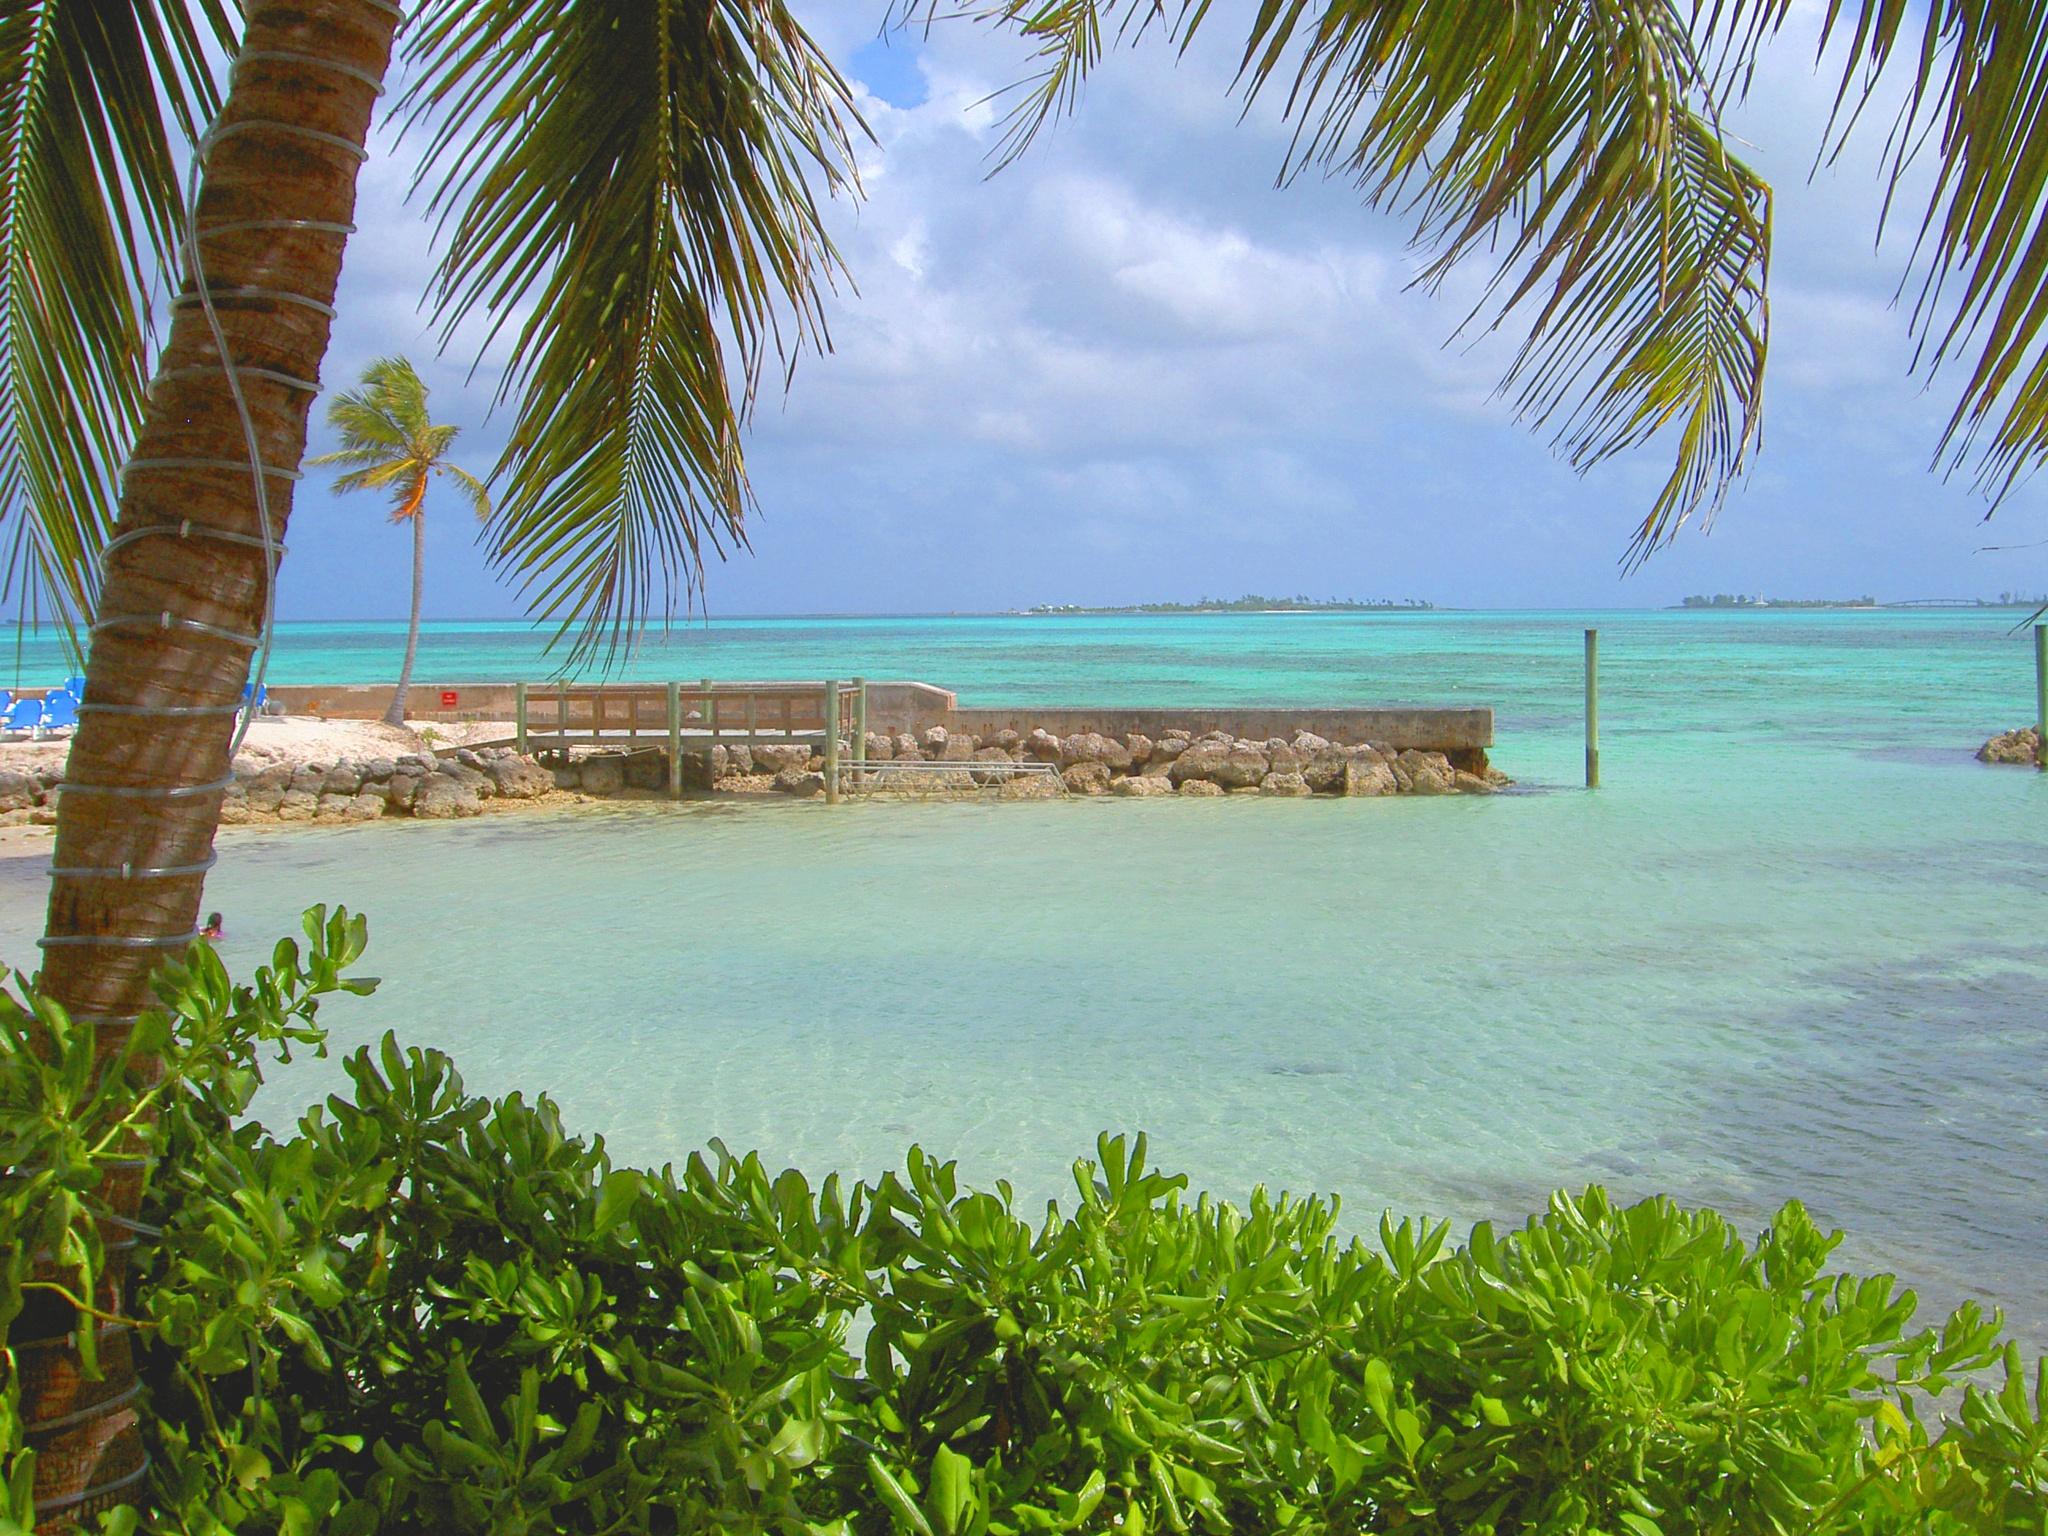 Bahama Beach by Tim Kessel